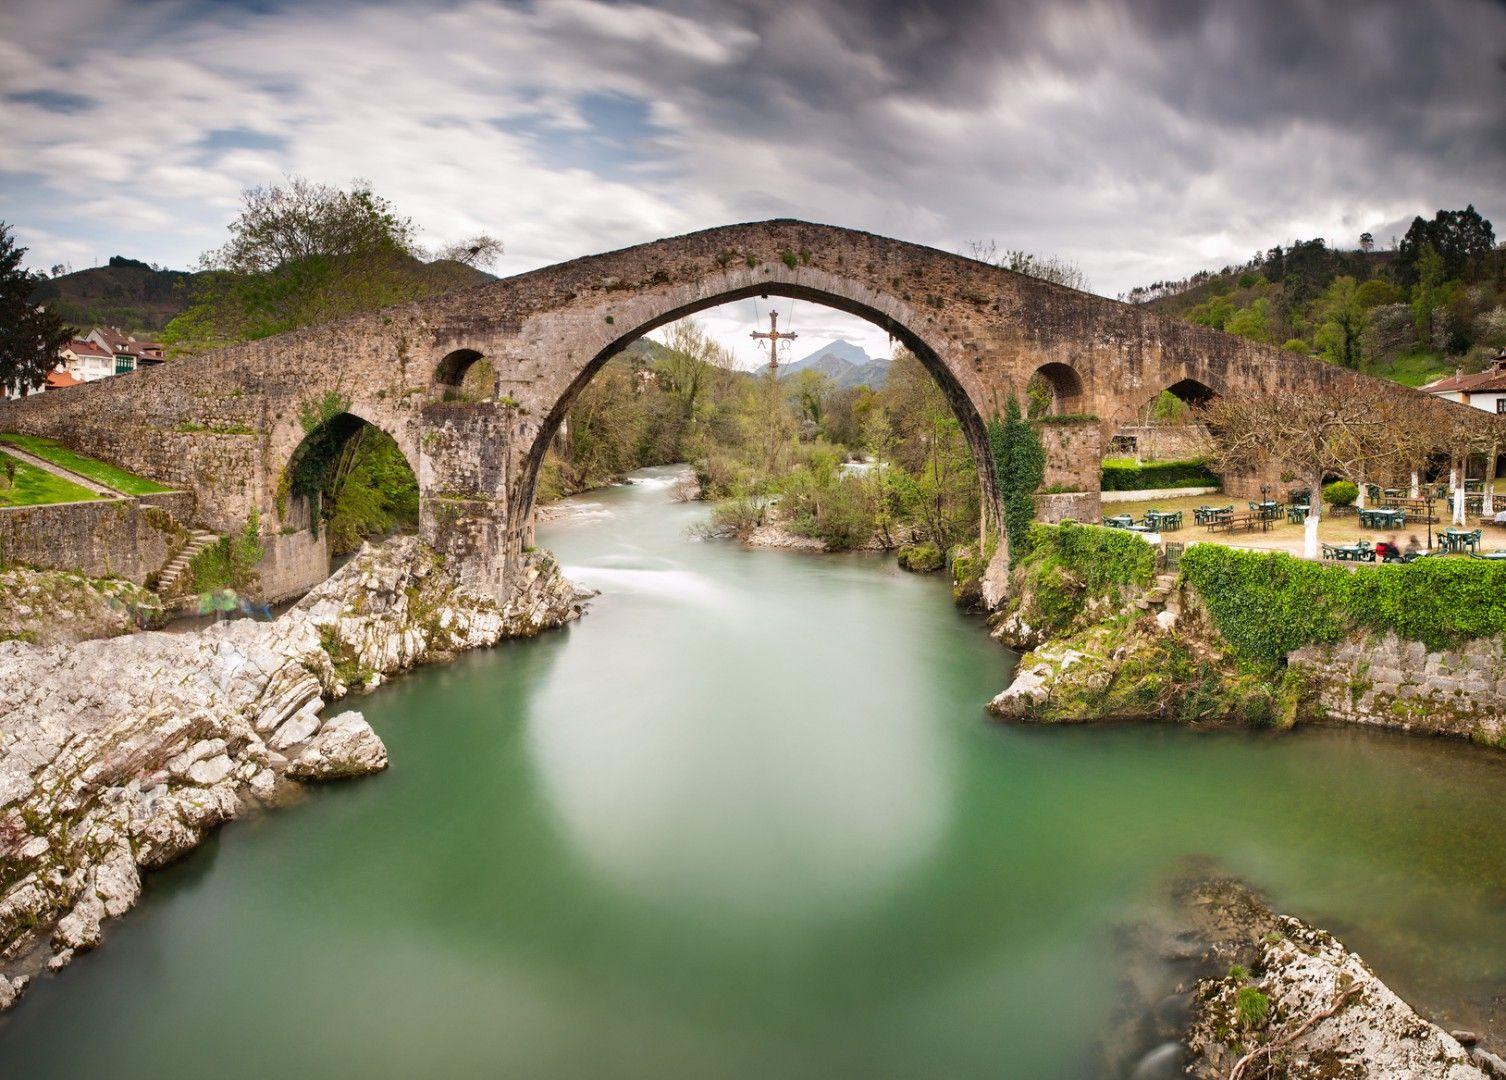 Old Roman stone bridge in Cangas de Onis (Asturias), Spain.